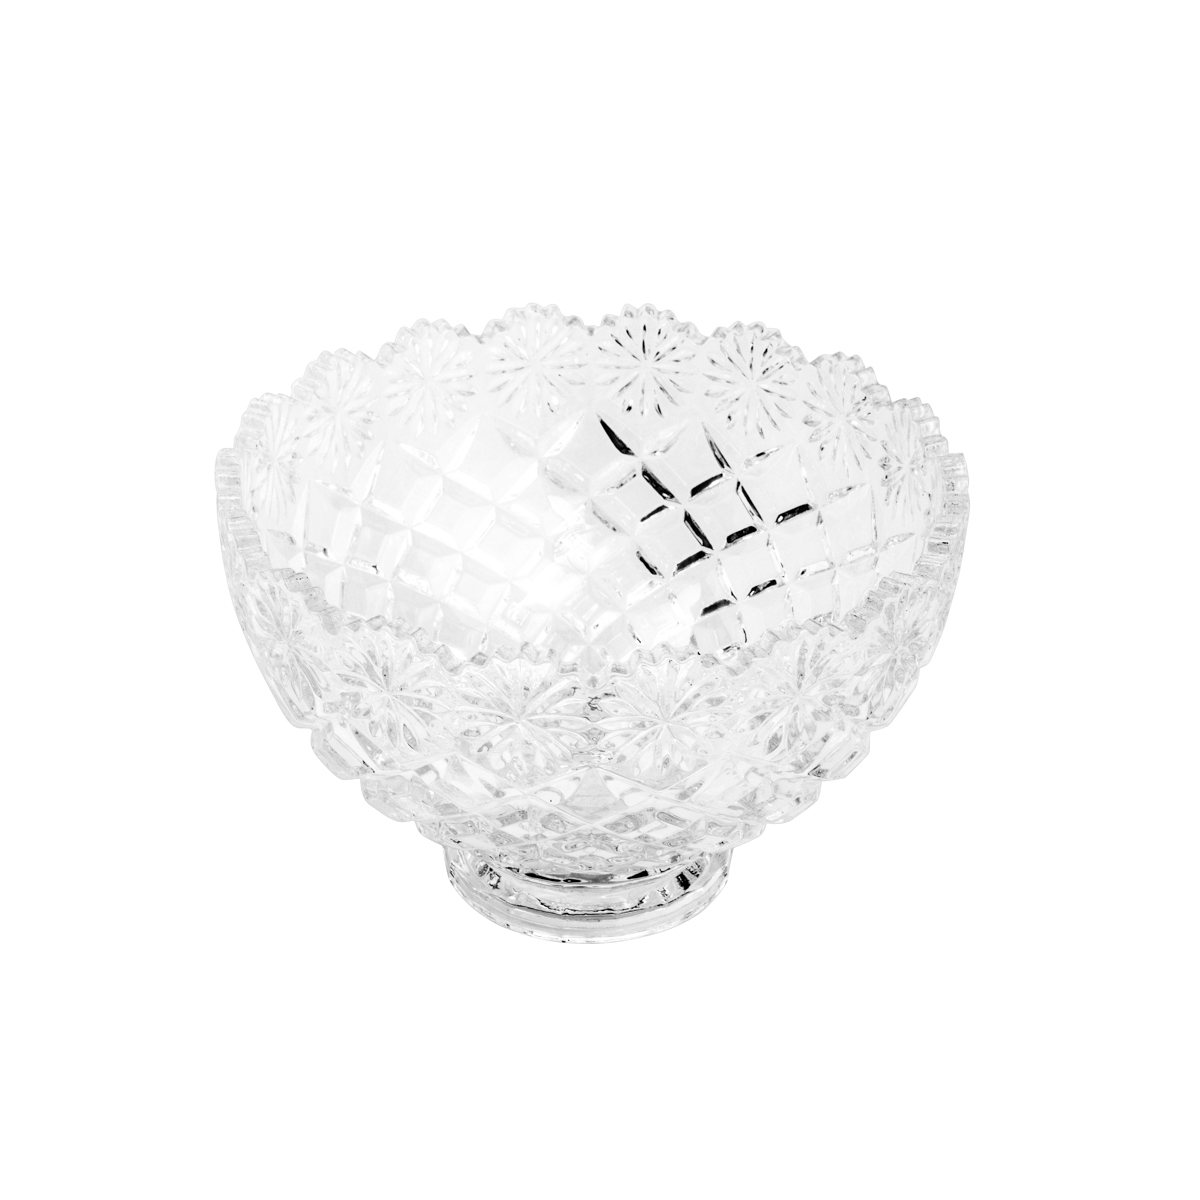 Bowl De Cristal De Chumbo Diamond Star Lyor